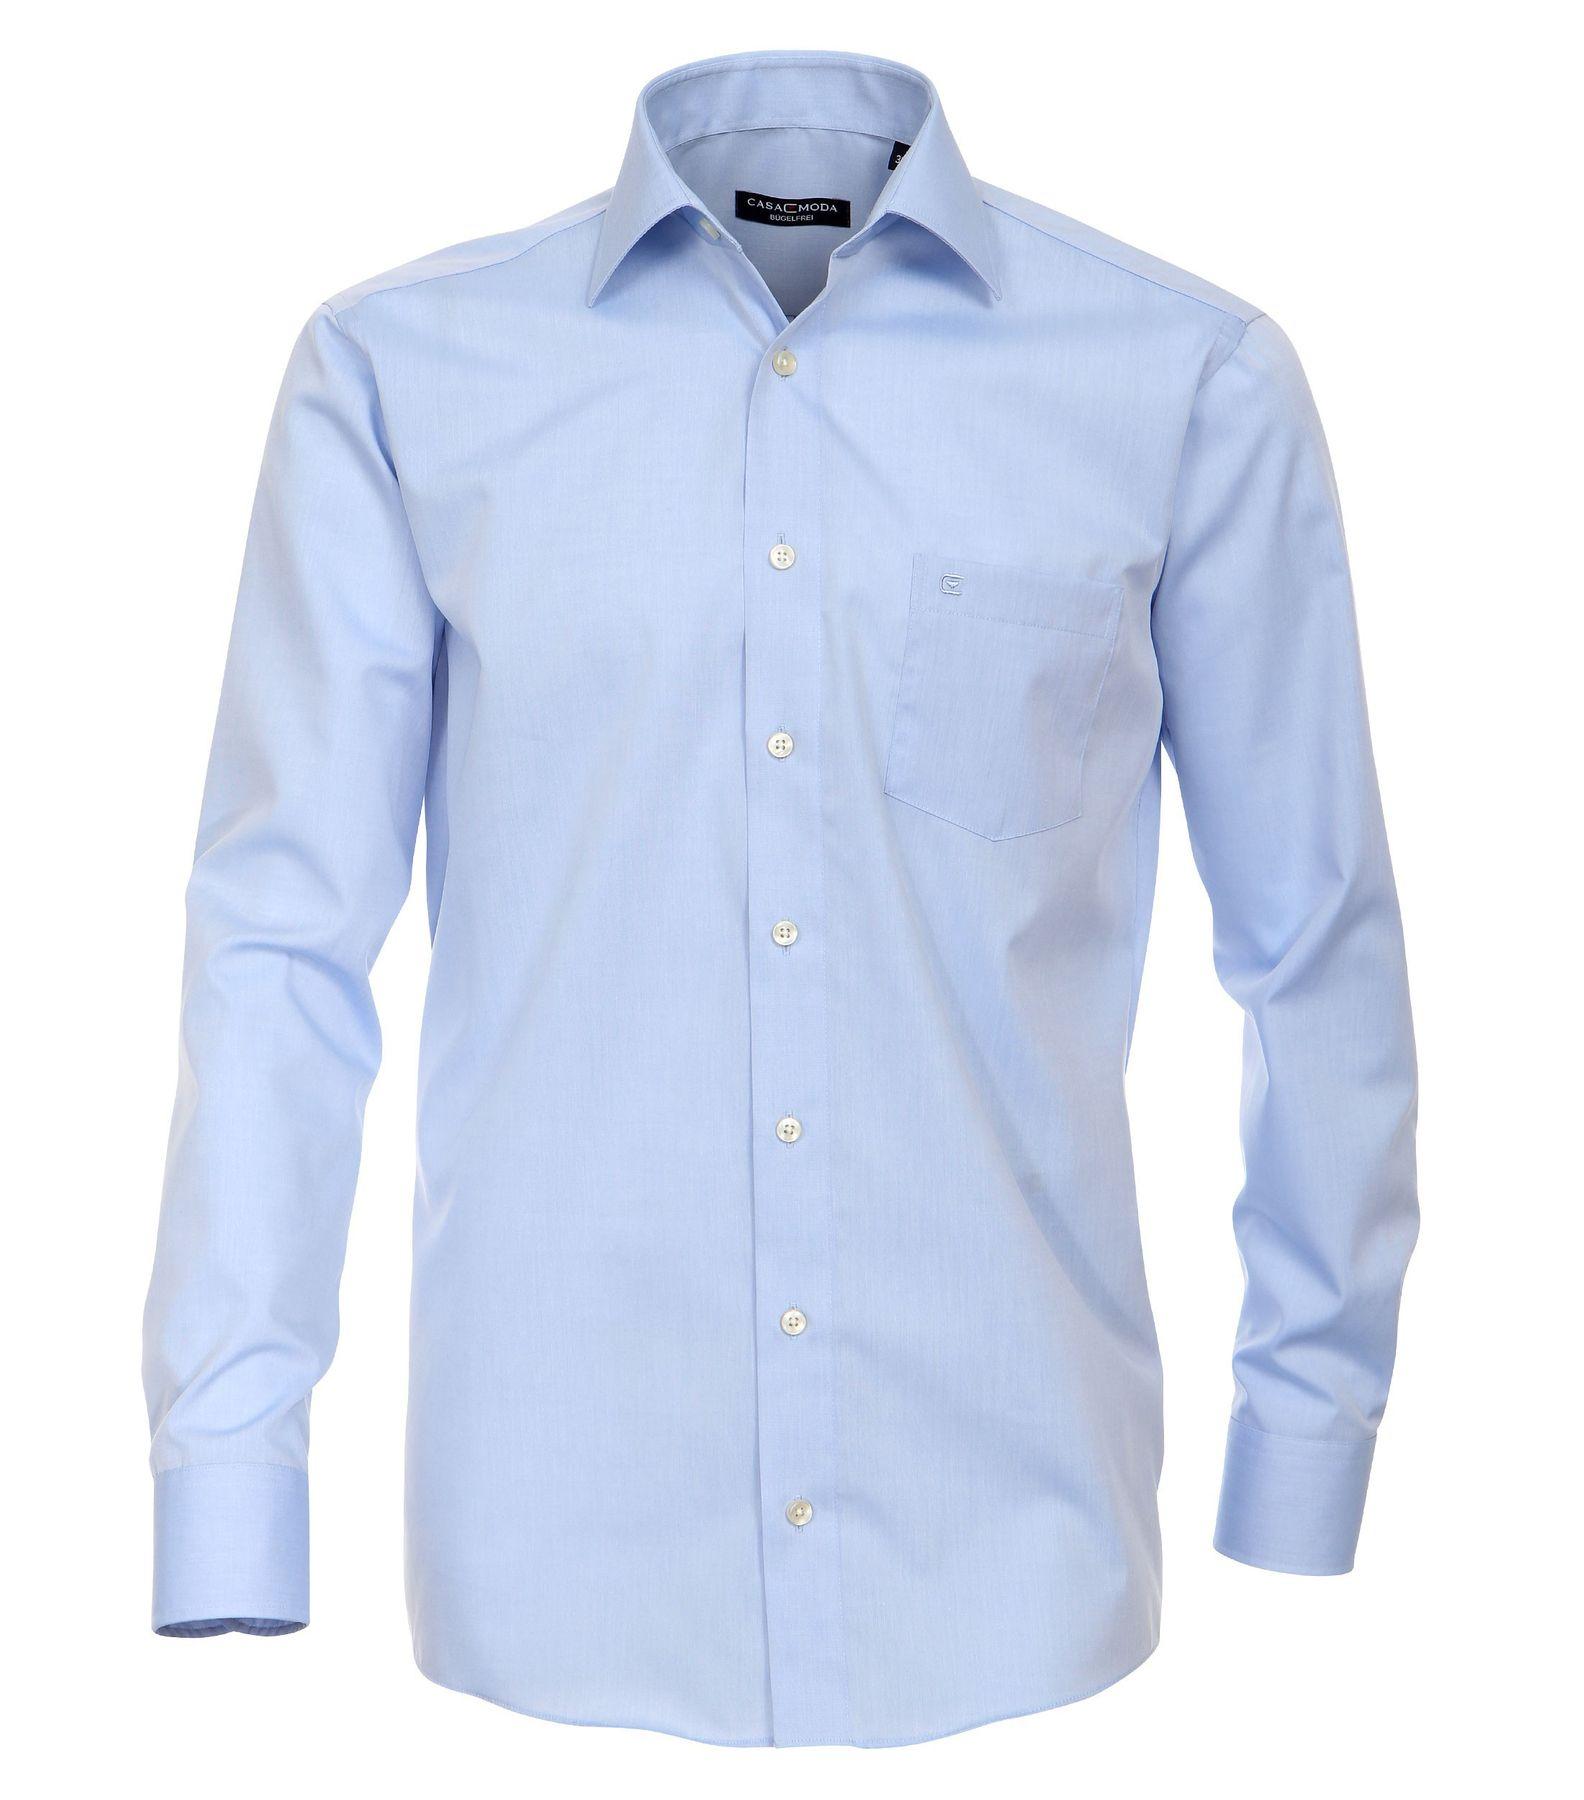 Casa Moda - Comfort Fit - Bügelfreies Herren Business Langarm Hemd verschiedene Farben (006060A) – Bild 5